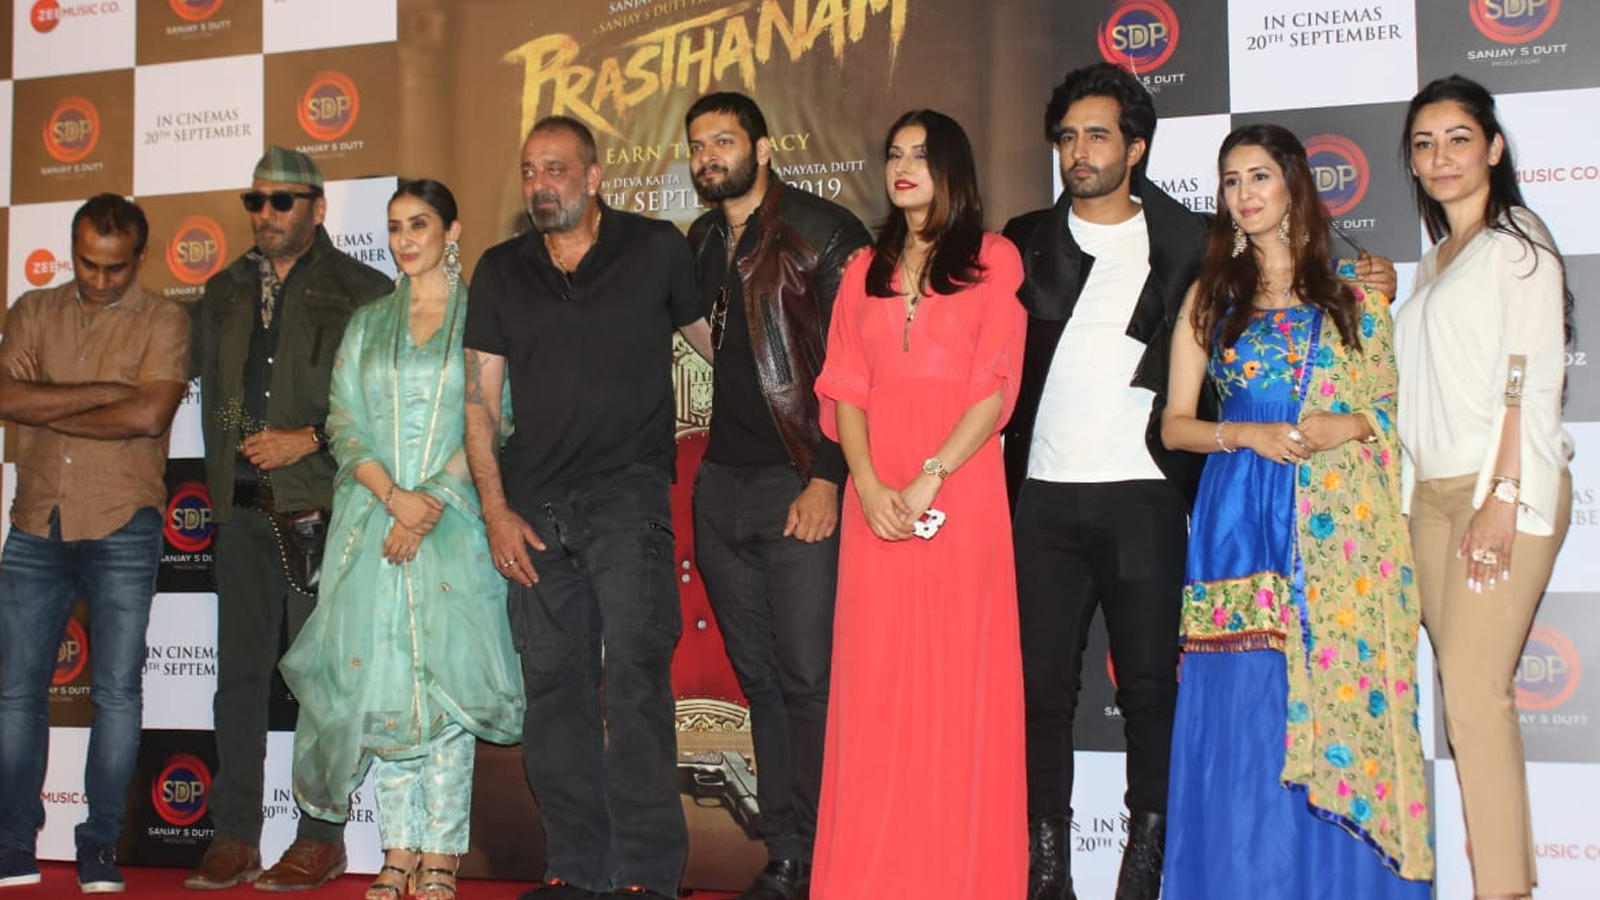 'Prasthanam': Teaser of Sanjay Dutt starrer political drama is out